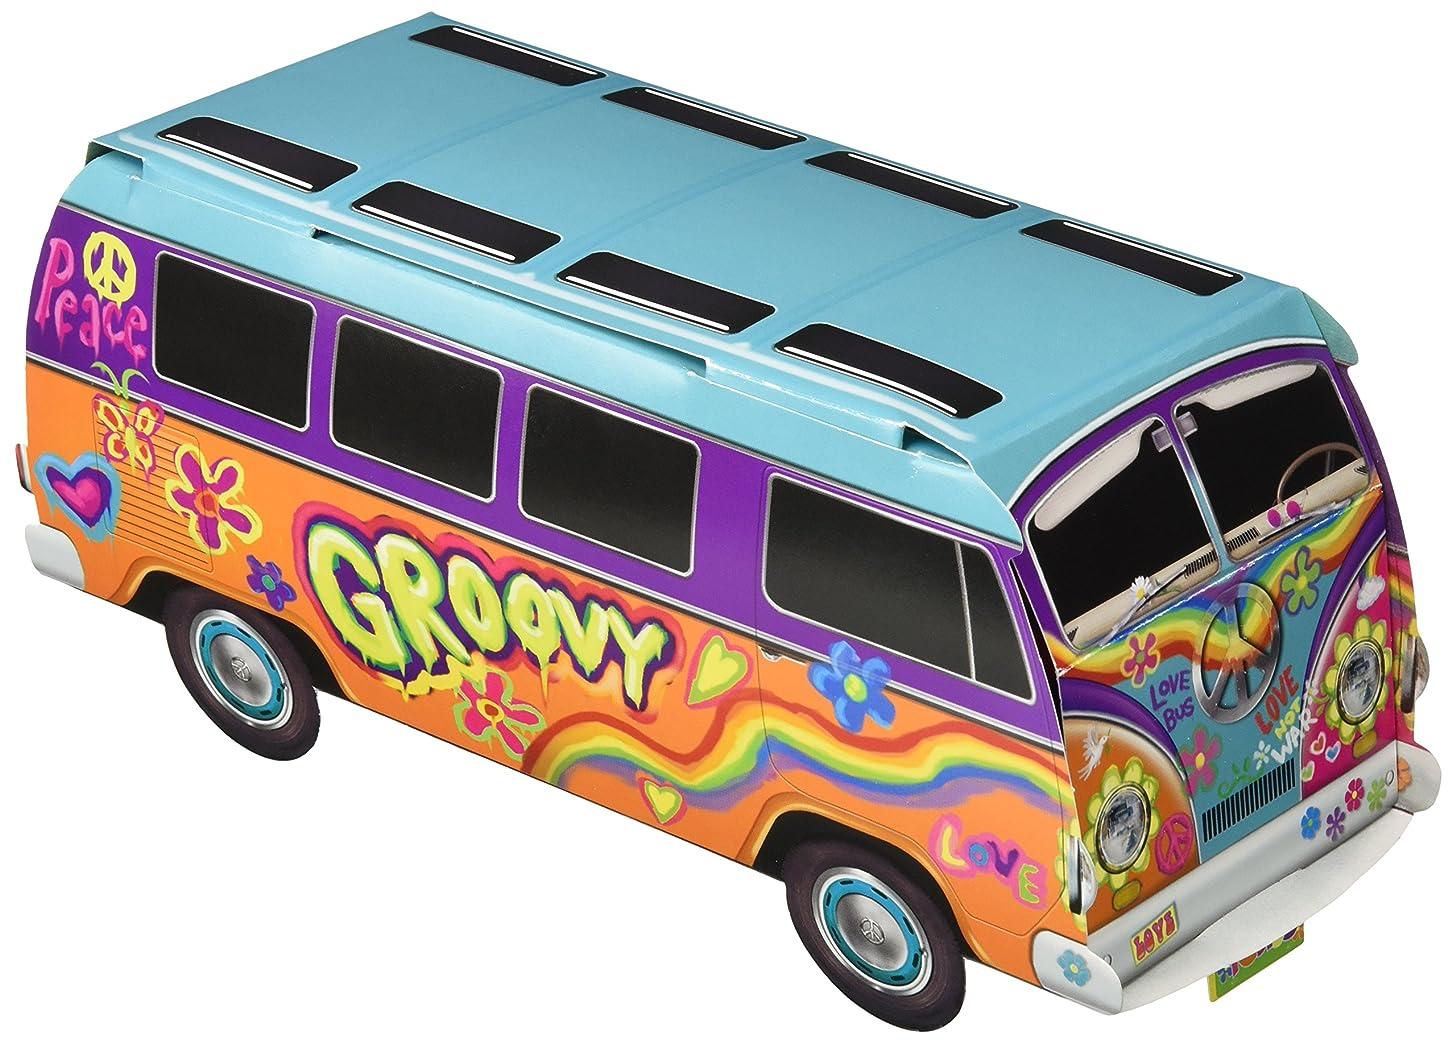 "Beistle 57326 3-D 60's Bus Centerpiece, 9.75"", Multicolored"